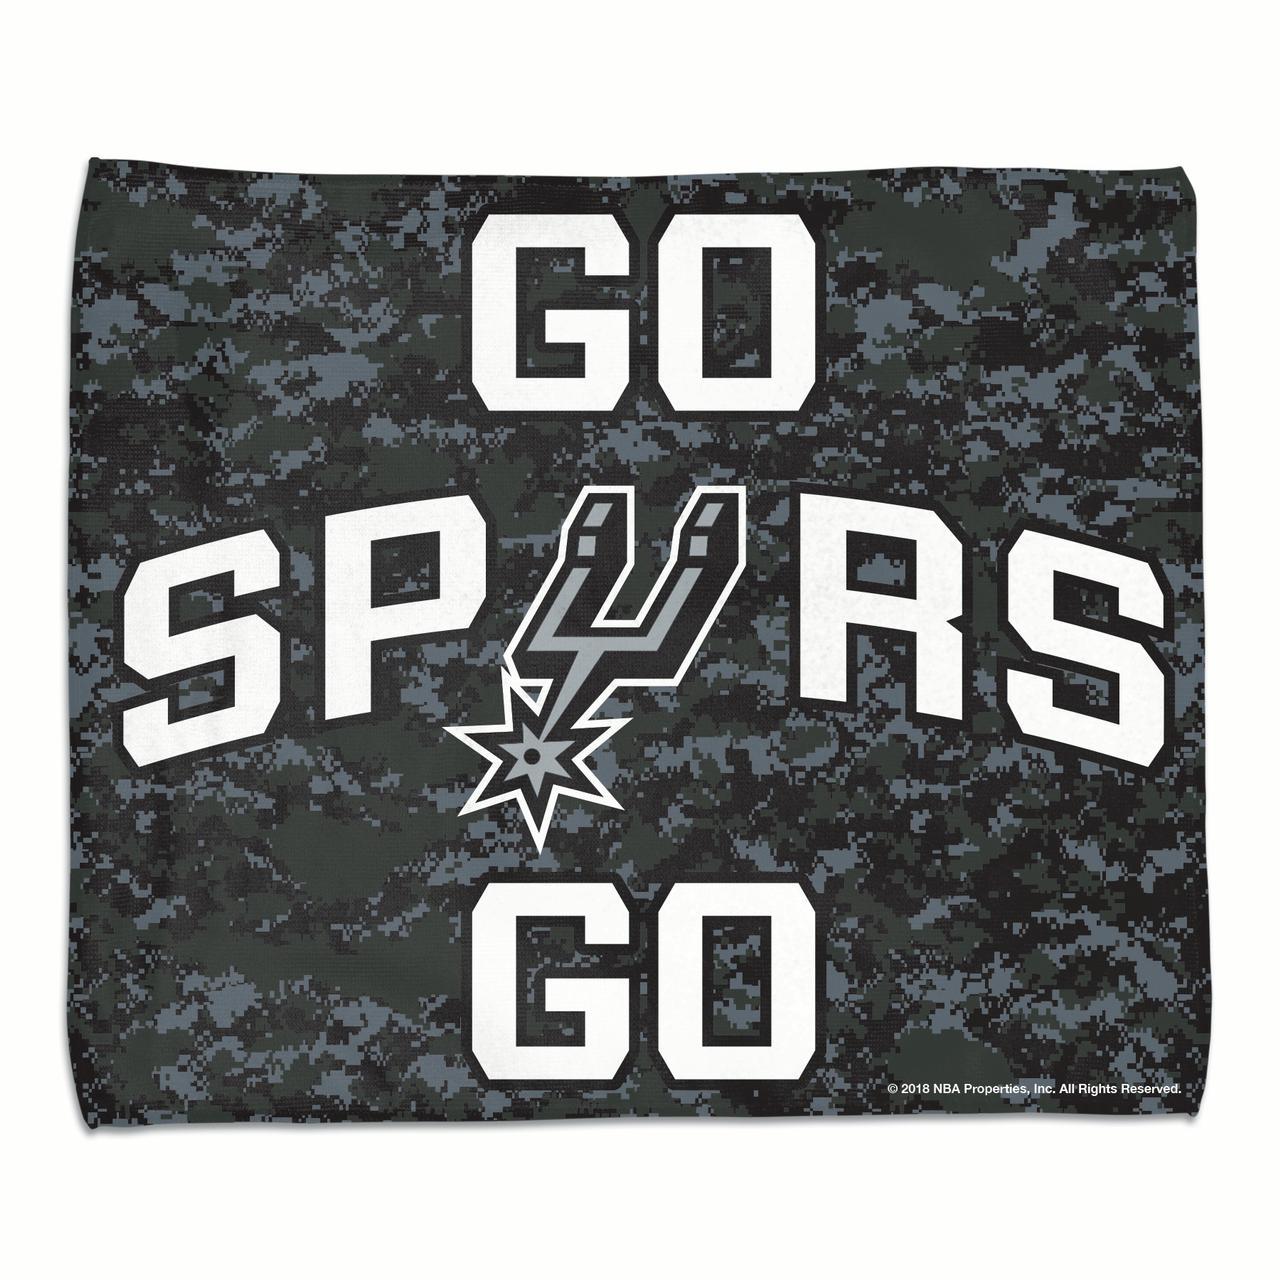 "San Antonio Spurs WinCraft 2018 NBA Playoffs 15"" x 18"" Rally Towel - No Size"